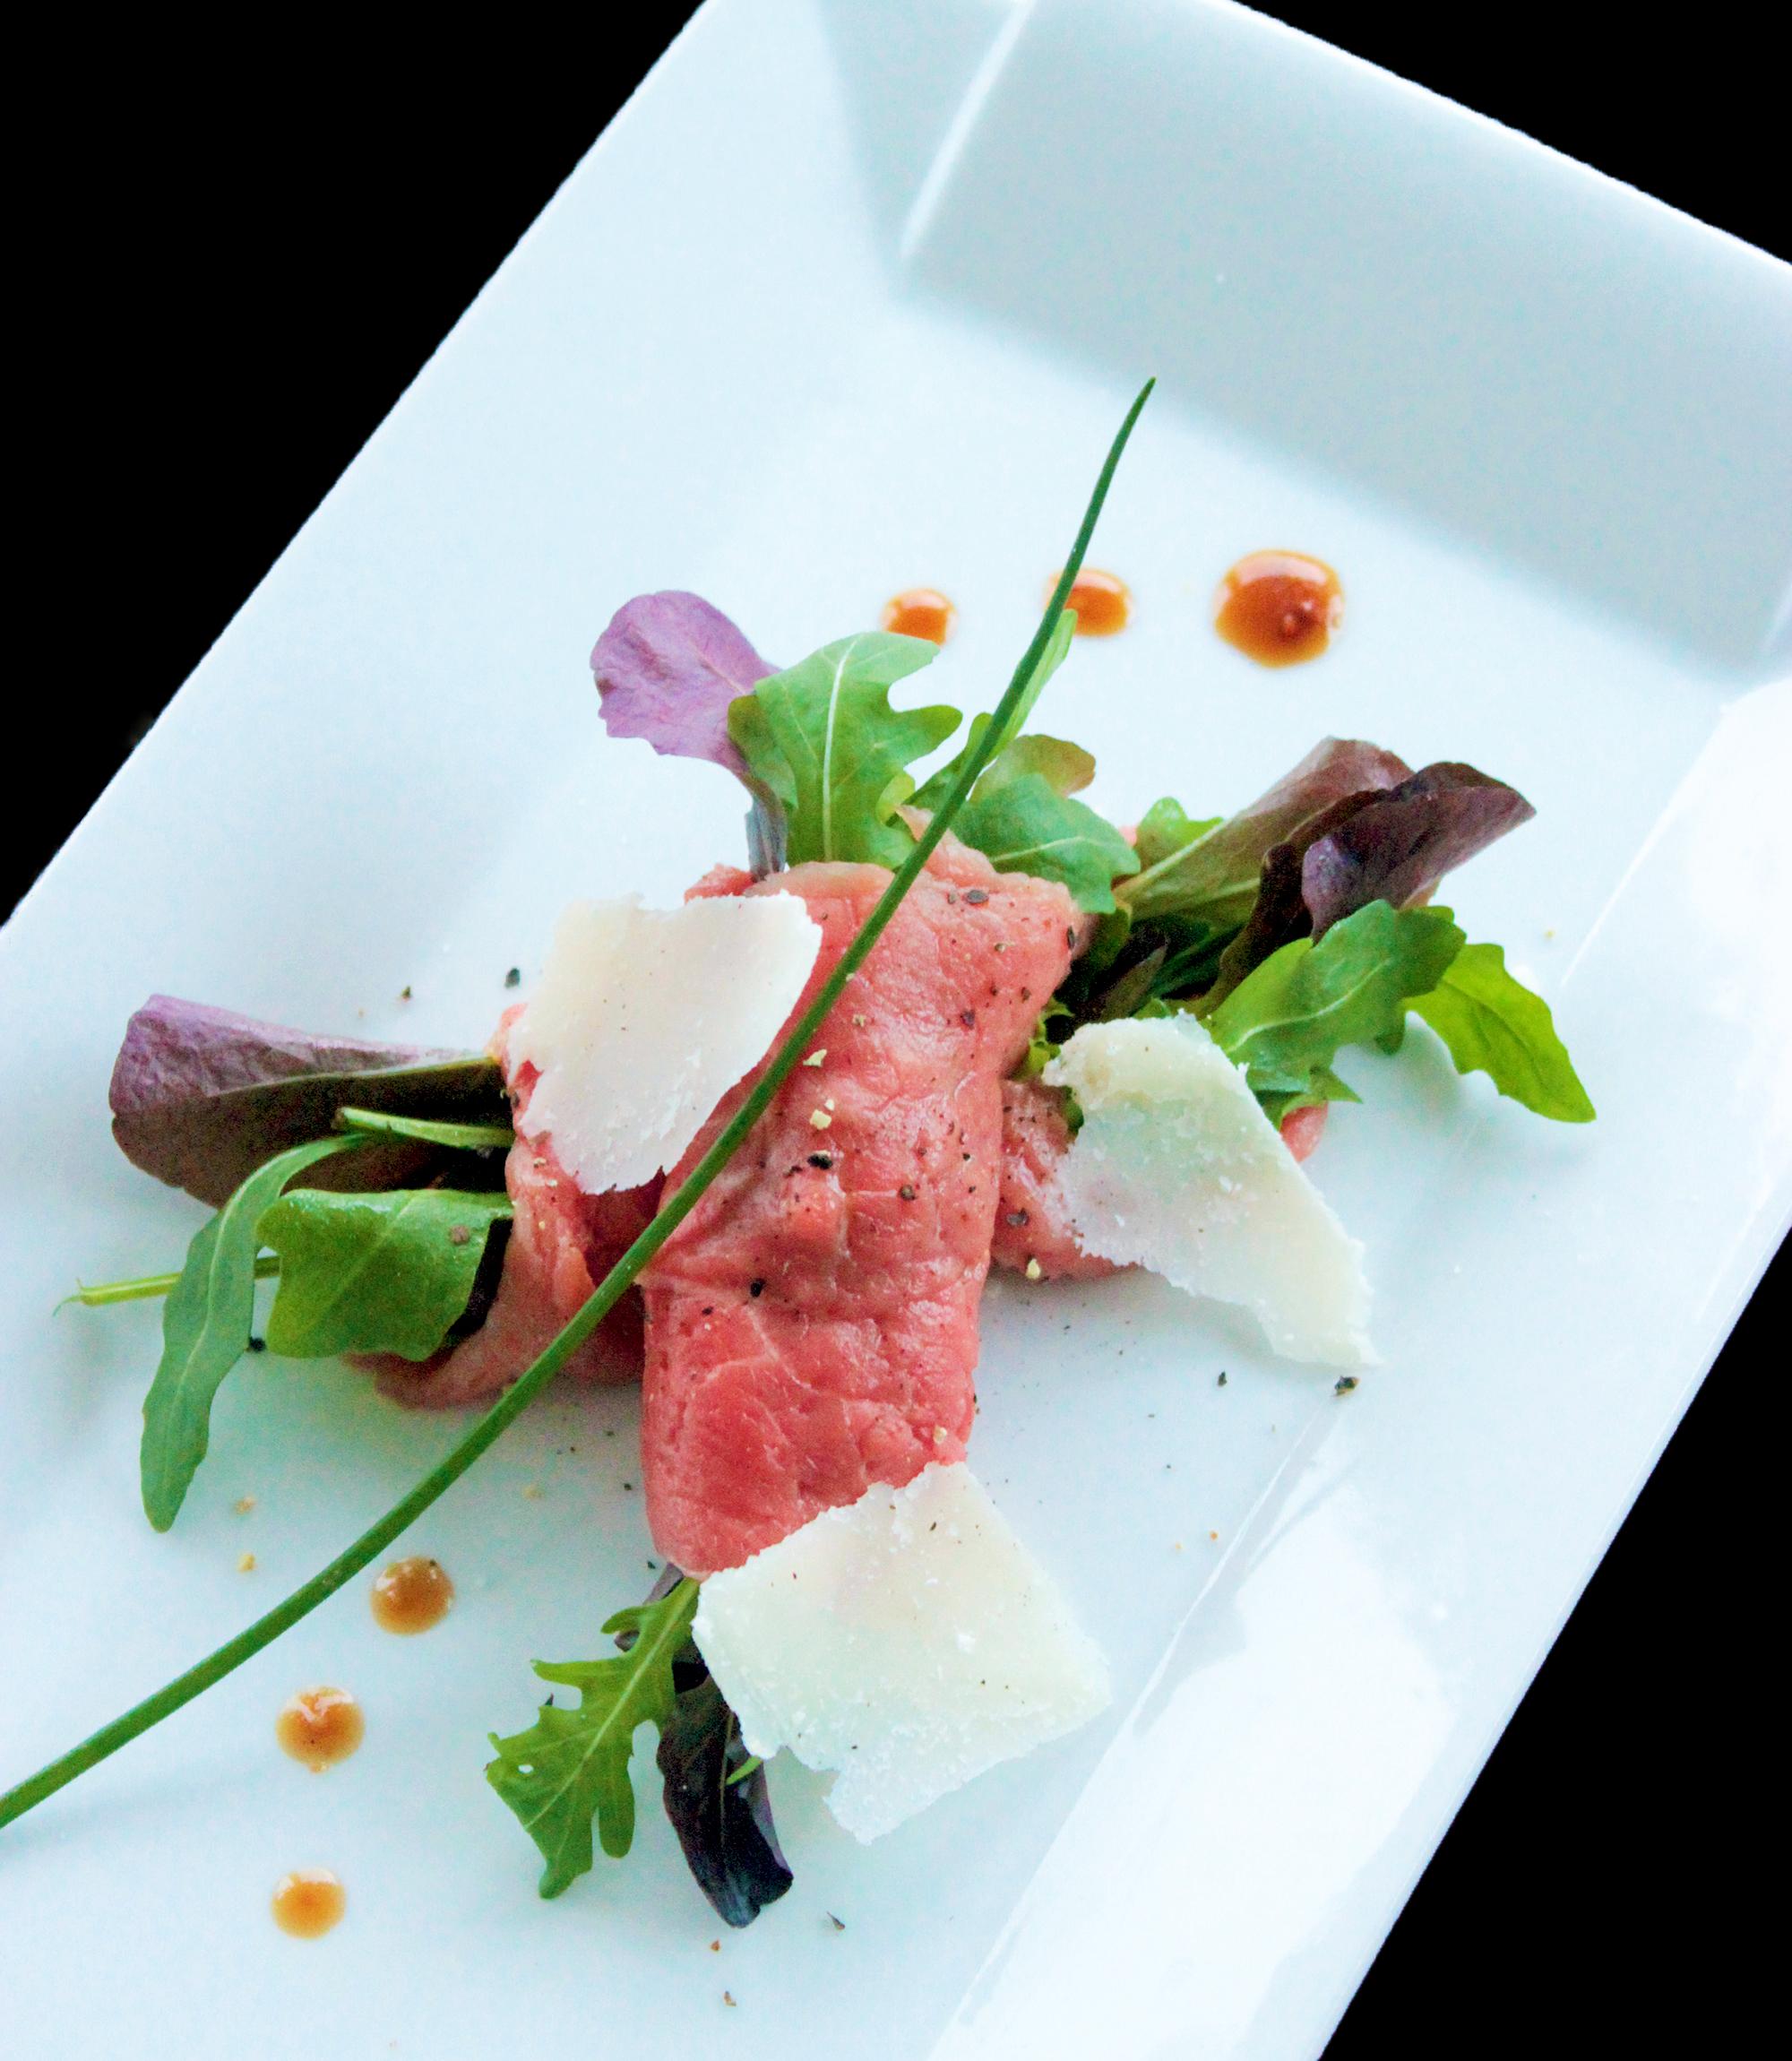 Italian Beef Carpaccio with Dijon Balsamic Vinaigrette - The Petite ...